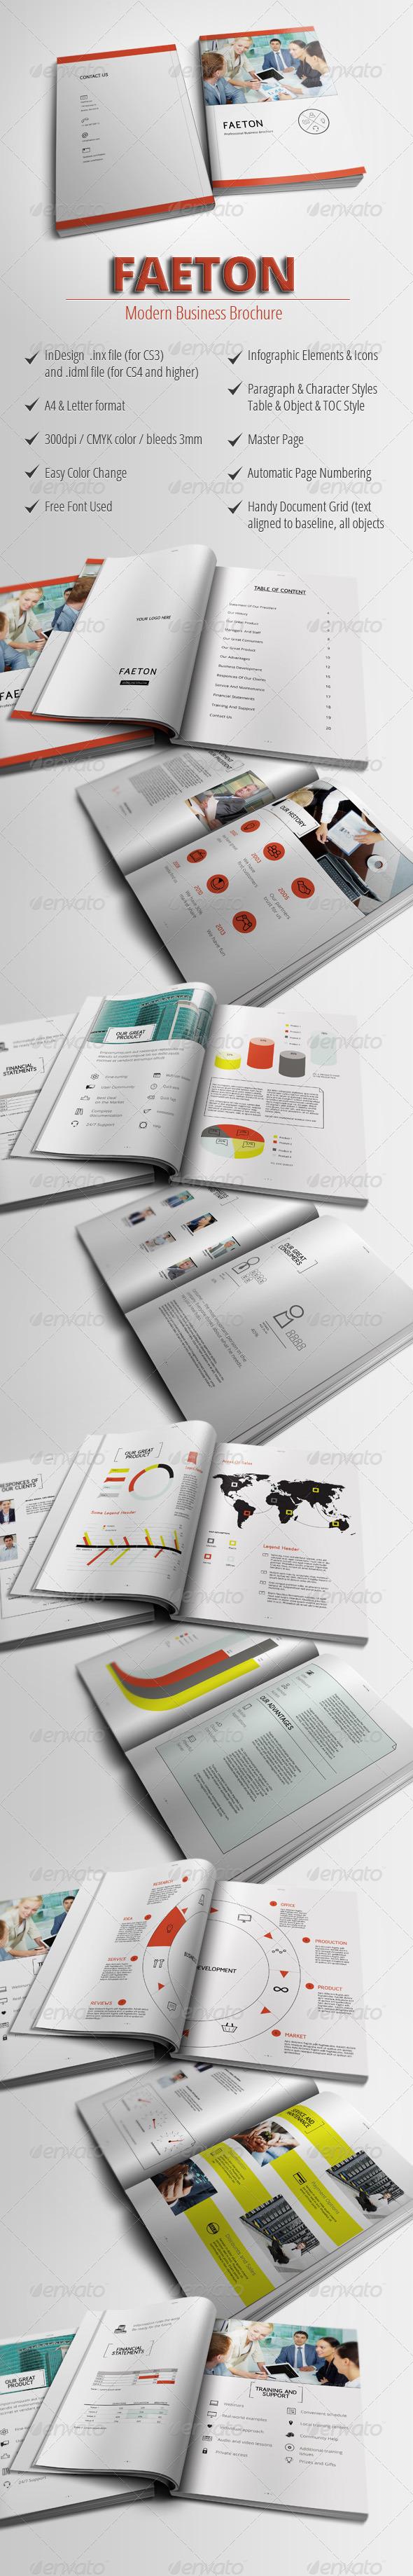 GraphicRiver Faeton Business Brochure 4390058